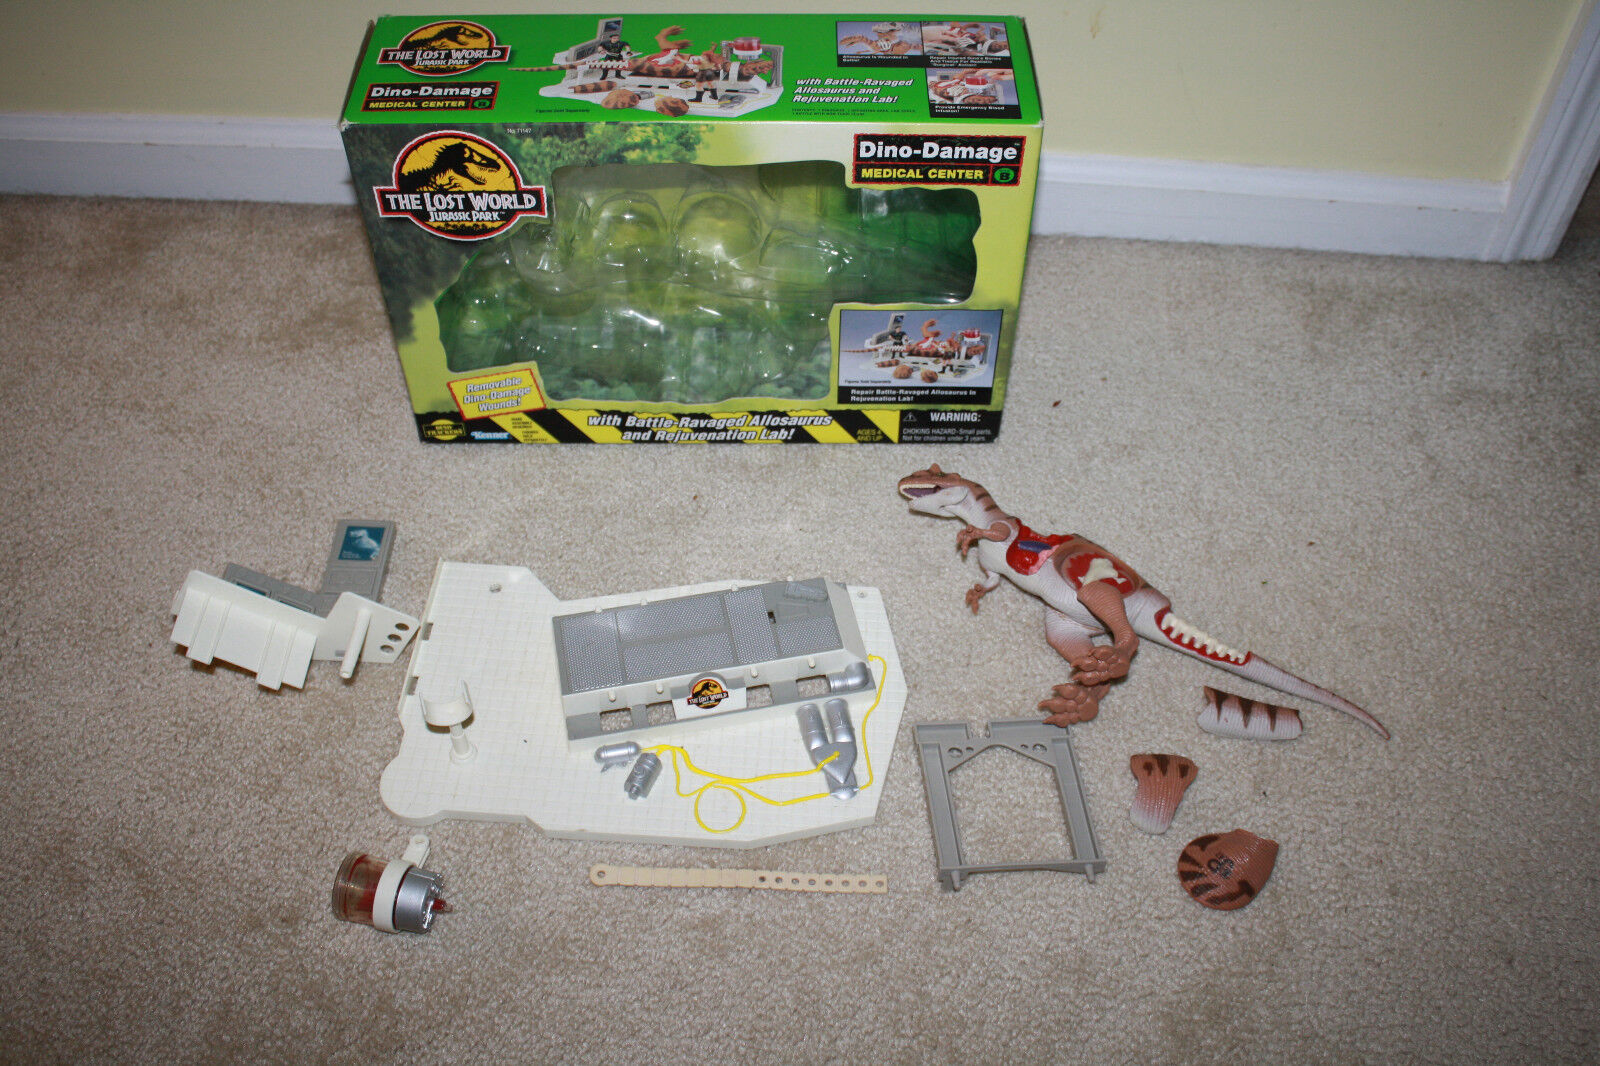 Vintage Kenner Lost World Jurassic Park Dino Damage Medical Center w/Box, Insert